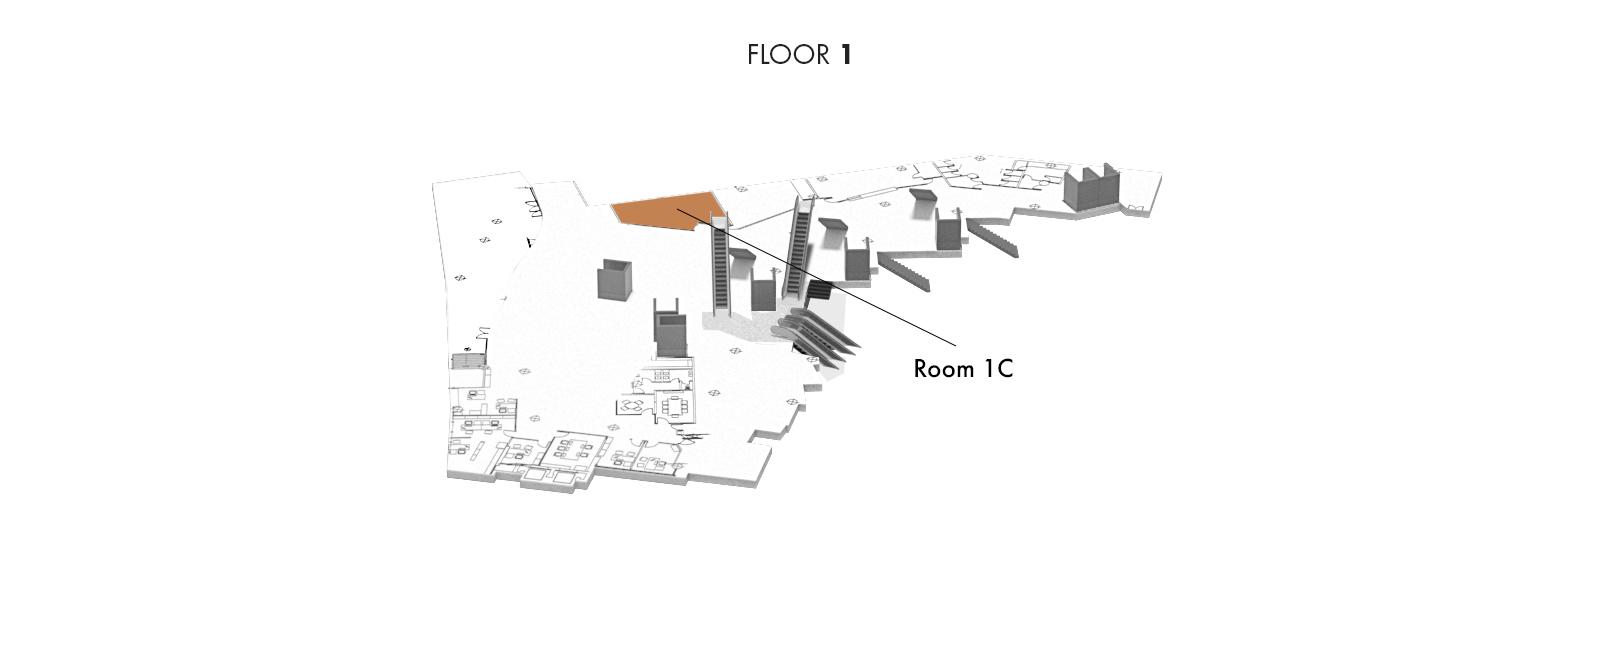 Room 1C, Floor 1   Palacio Euskalduna Jauregia